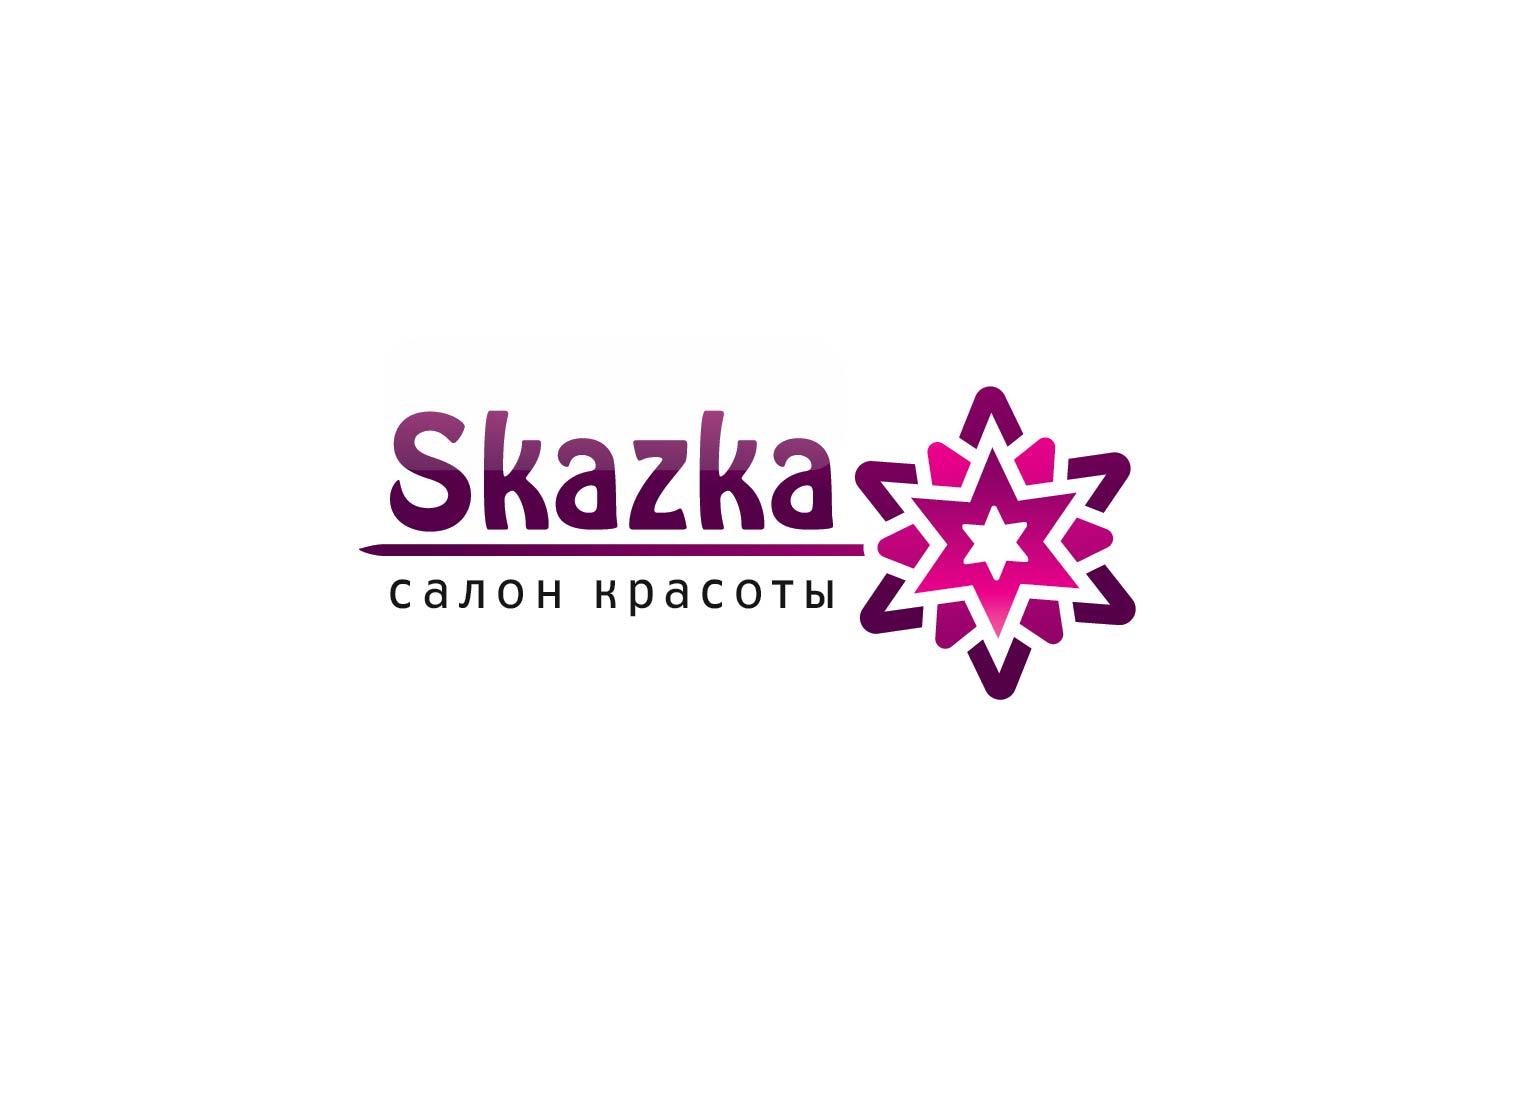 Логотип для салона красоты фото f_9605357a0306bad0.jpg